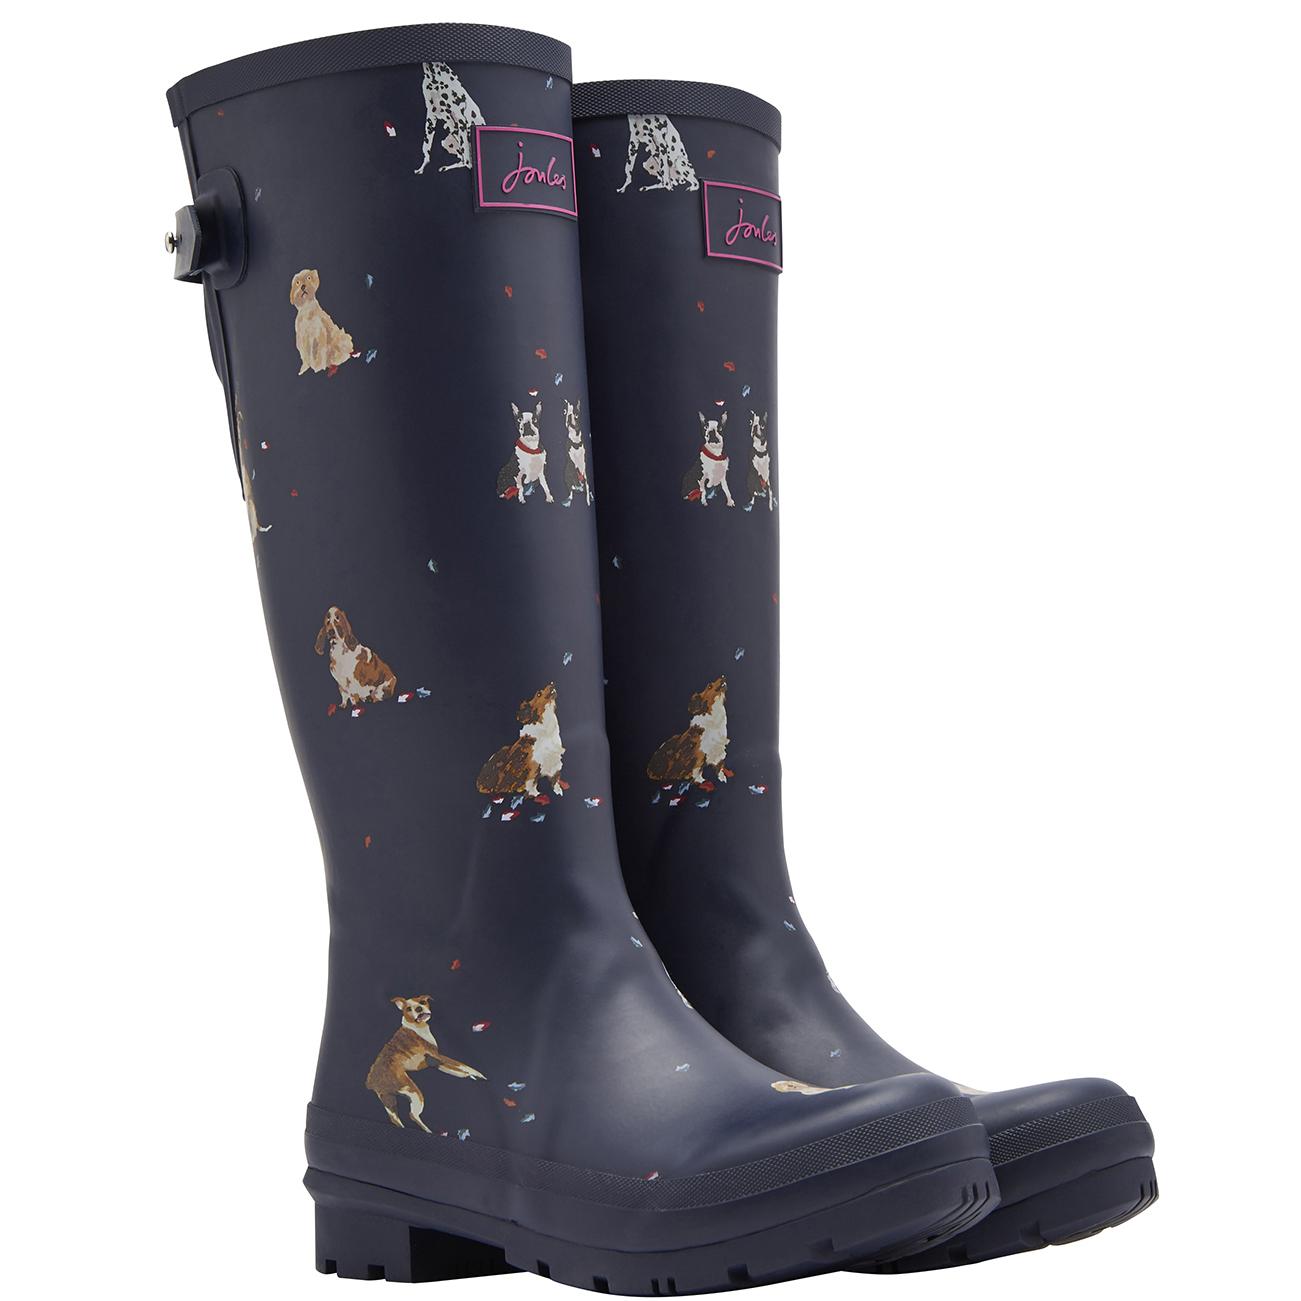 4e41d0f480f1 Womens Joules Printed Wellies Waterproof Wellington Wellies Boots EU 36-42  | eBay